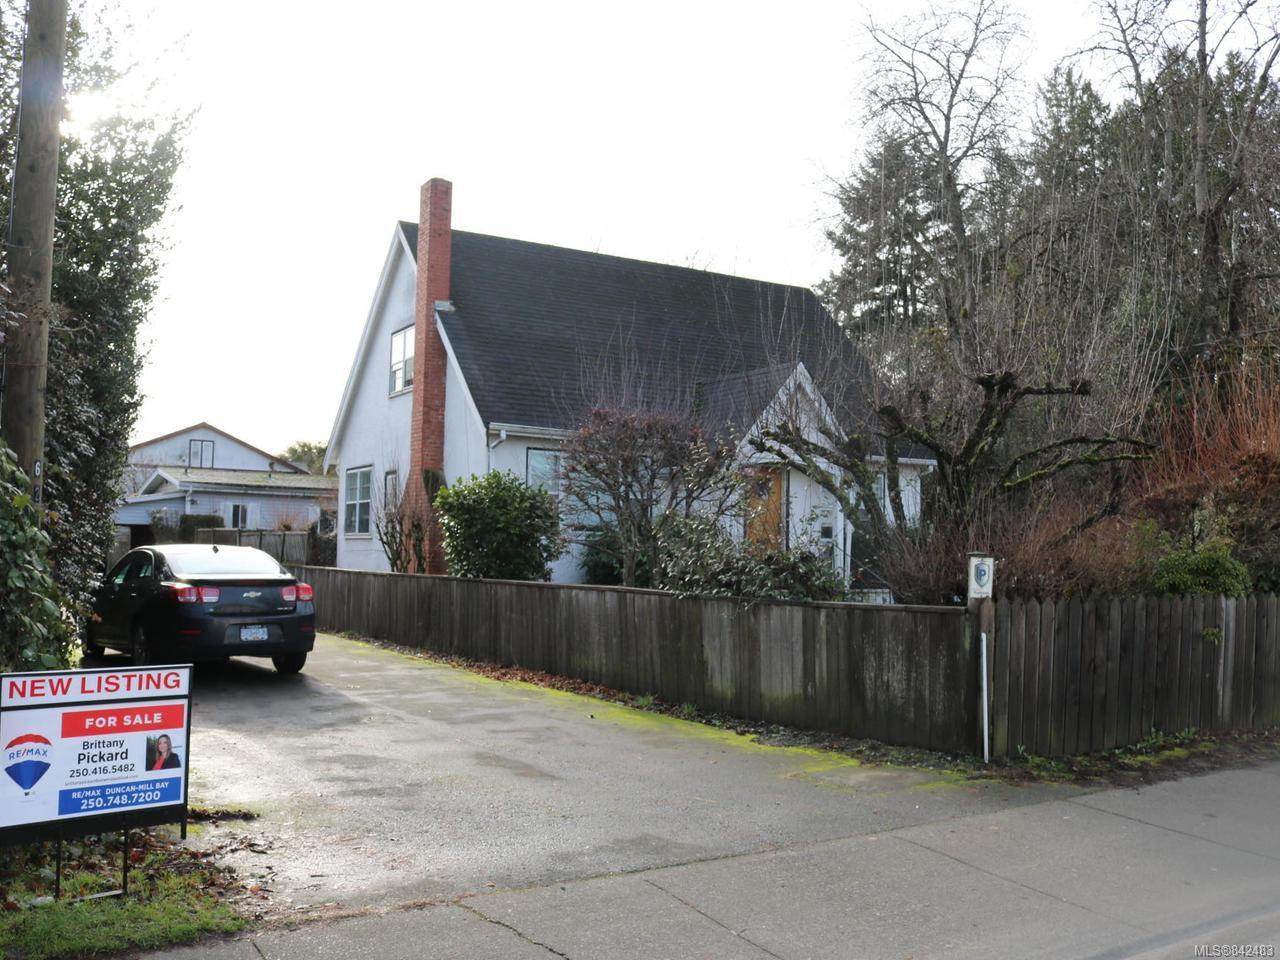 Main Photo: 620 & 624 Trunk Rd in : Du East Duncan House for sale (Duncan)  : MLS®# 842483